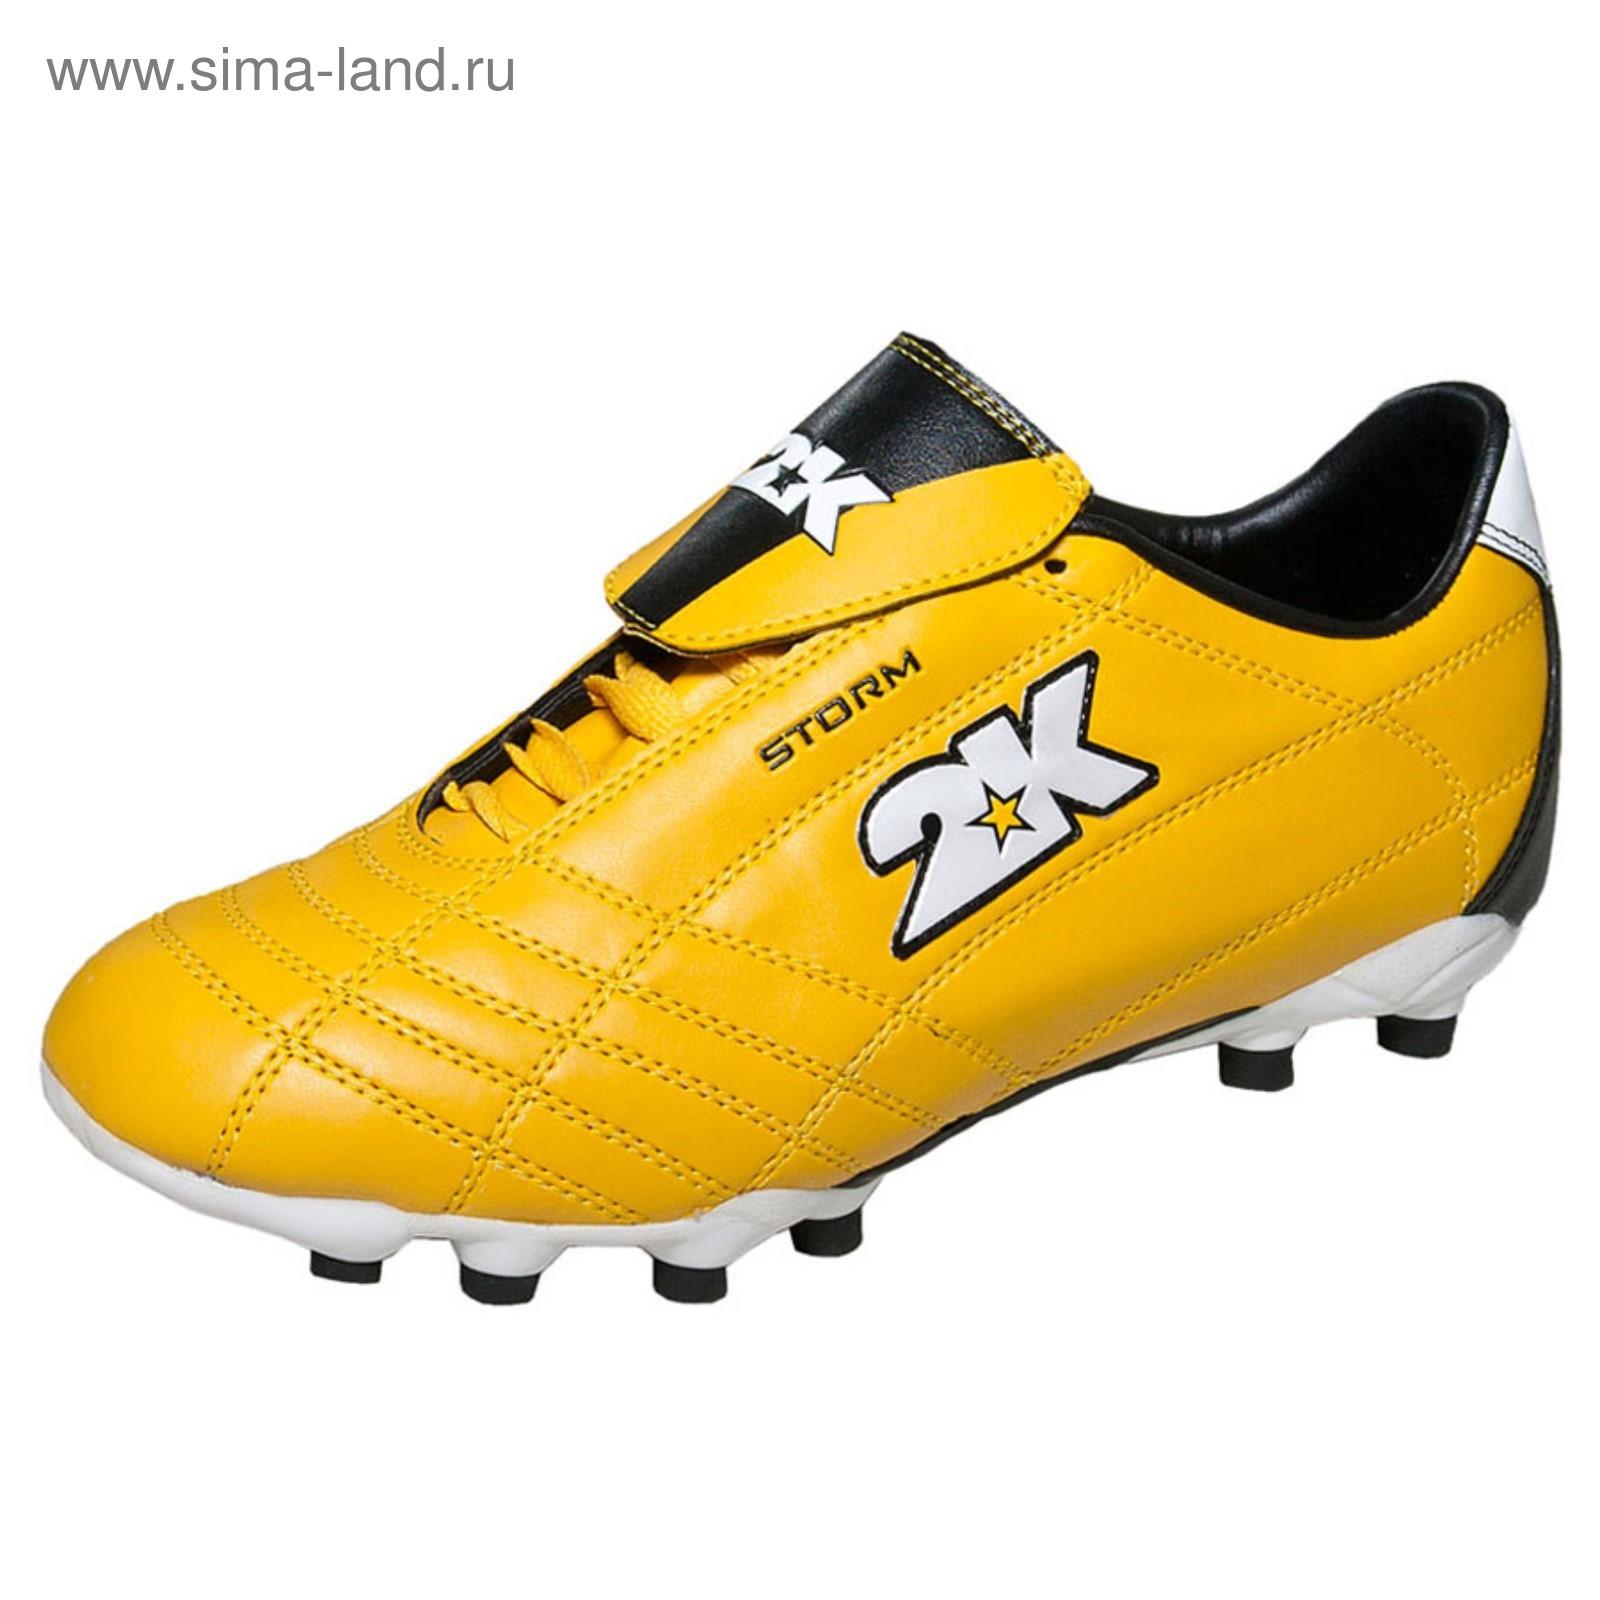 f47baaaf Футбольные бутсы 2K Sport Storm (13 шипов), yellow, размер 46 ...